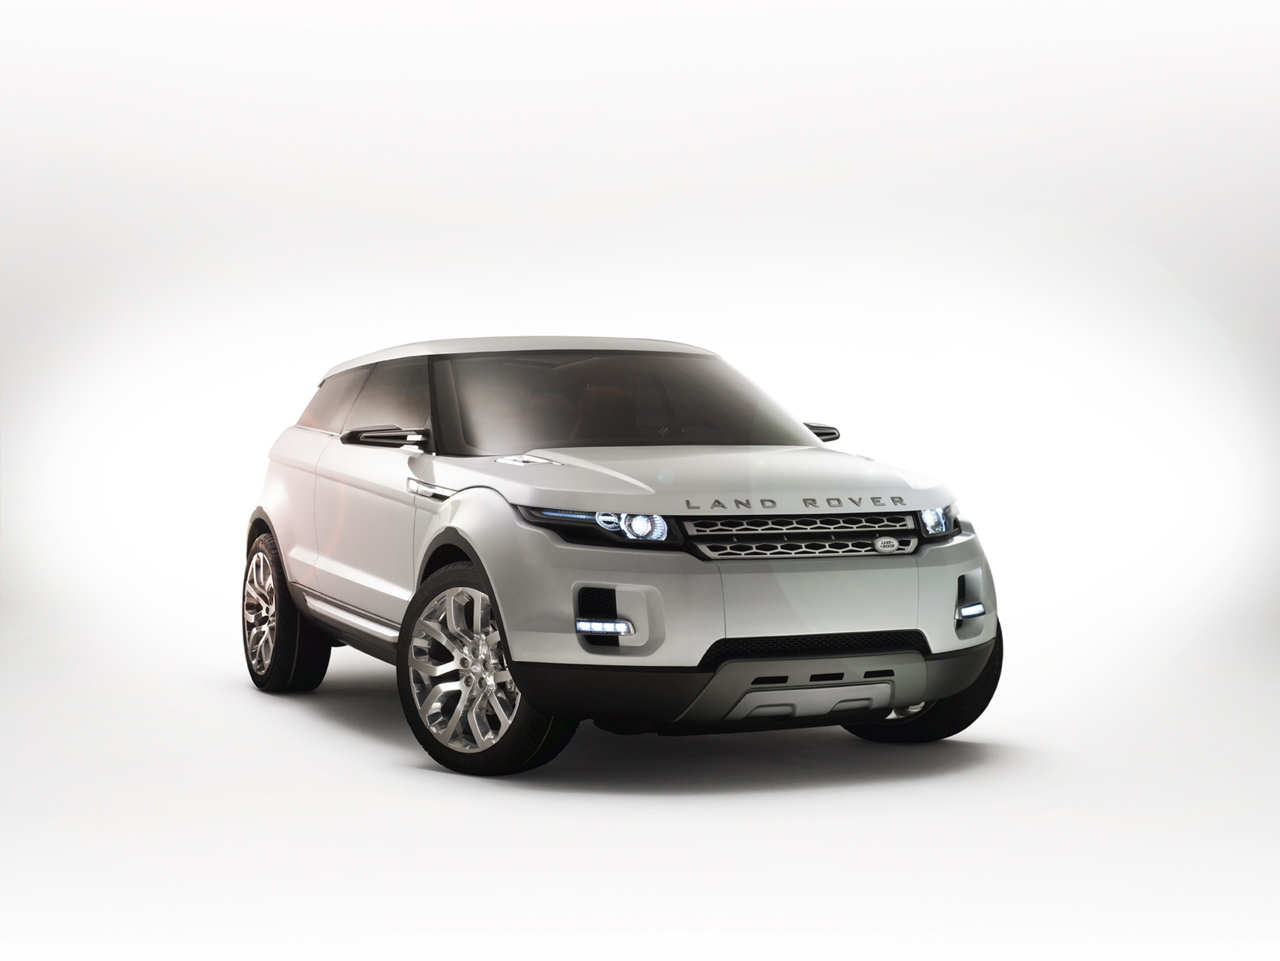 http://2.bp.blogspot.com/-j4yG1d2dCgU/UFhWpgBN-iI/AAAAAAAAElE/WQX_2lUlf5Y/s1600/2012+Range+Rover+Evoque-side.jpg